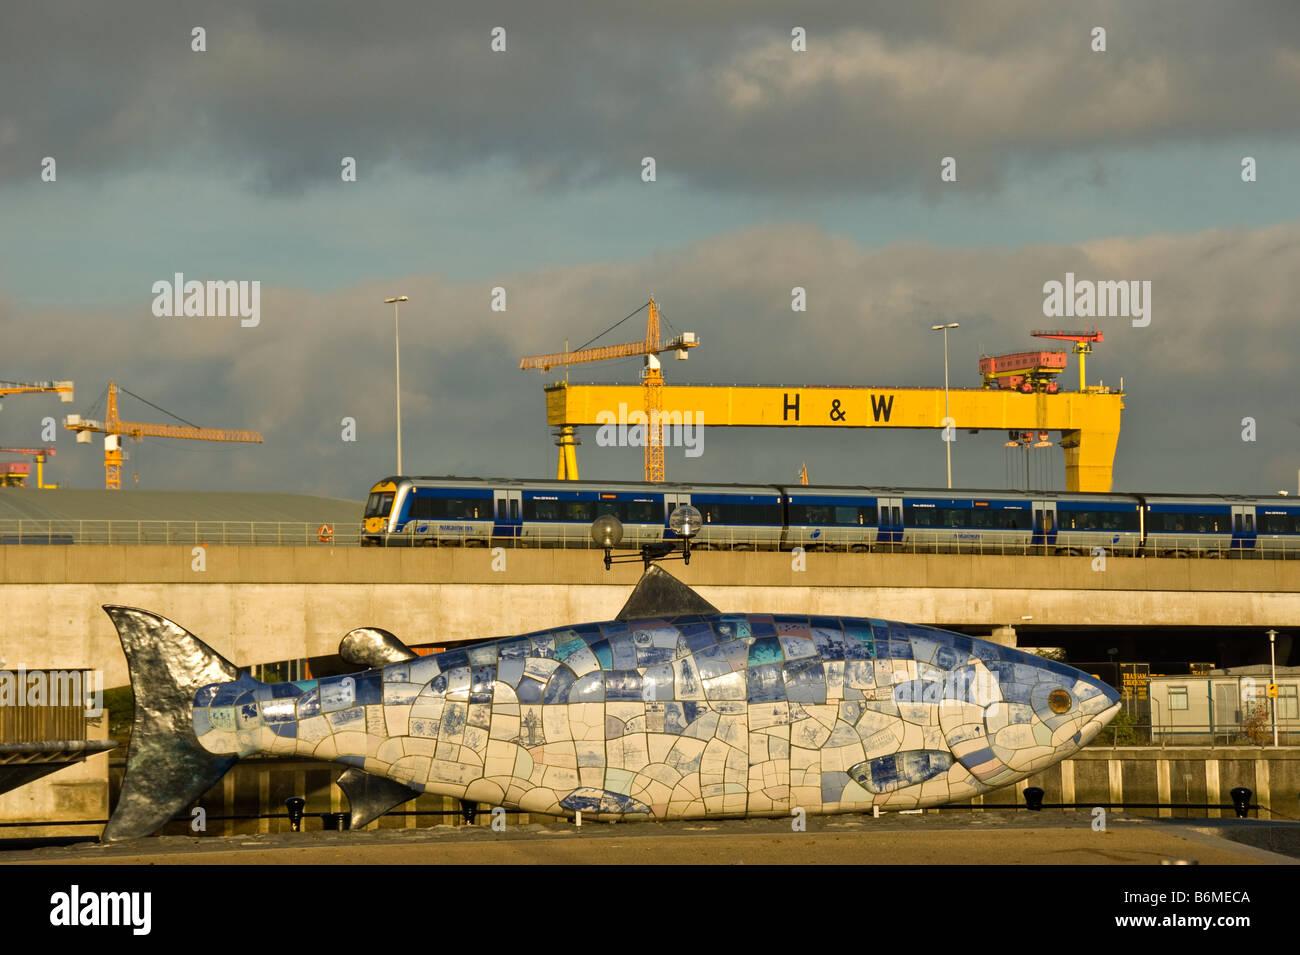 Belfast skyline big fish sculpture public art popular tourist attraction Northern Ireland HW yellow crane NI Railways - Stock Image